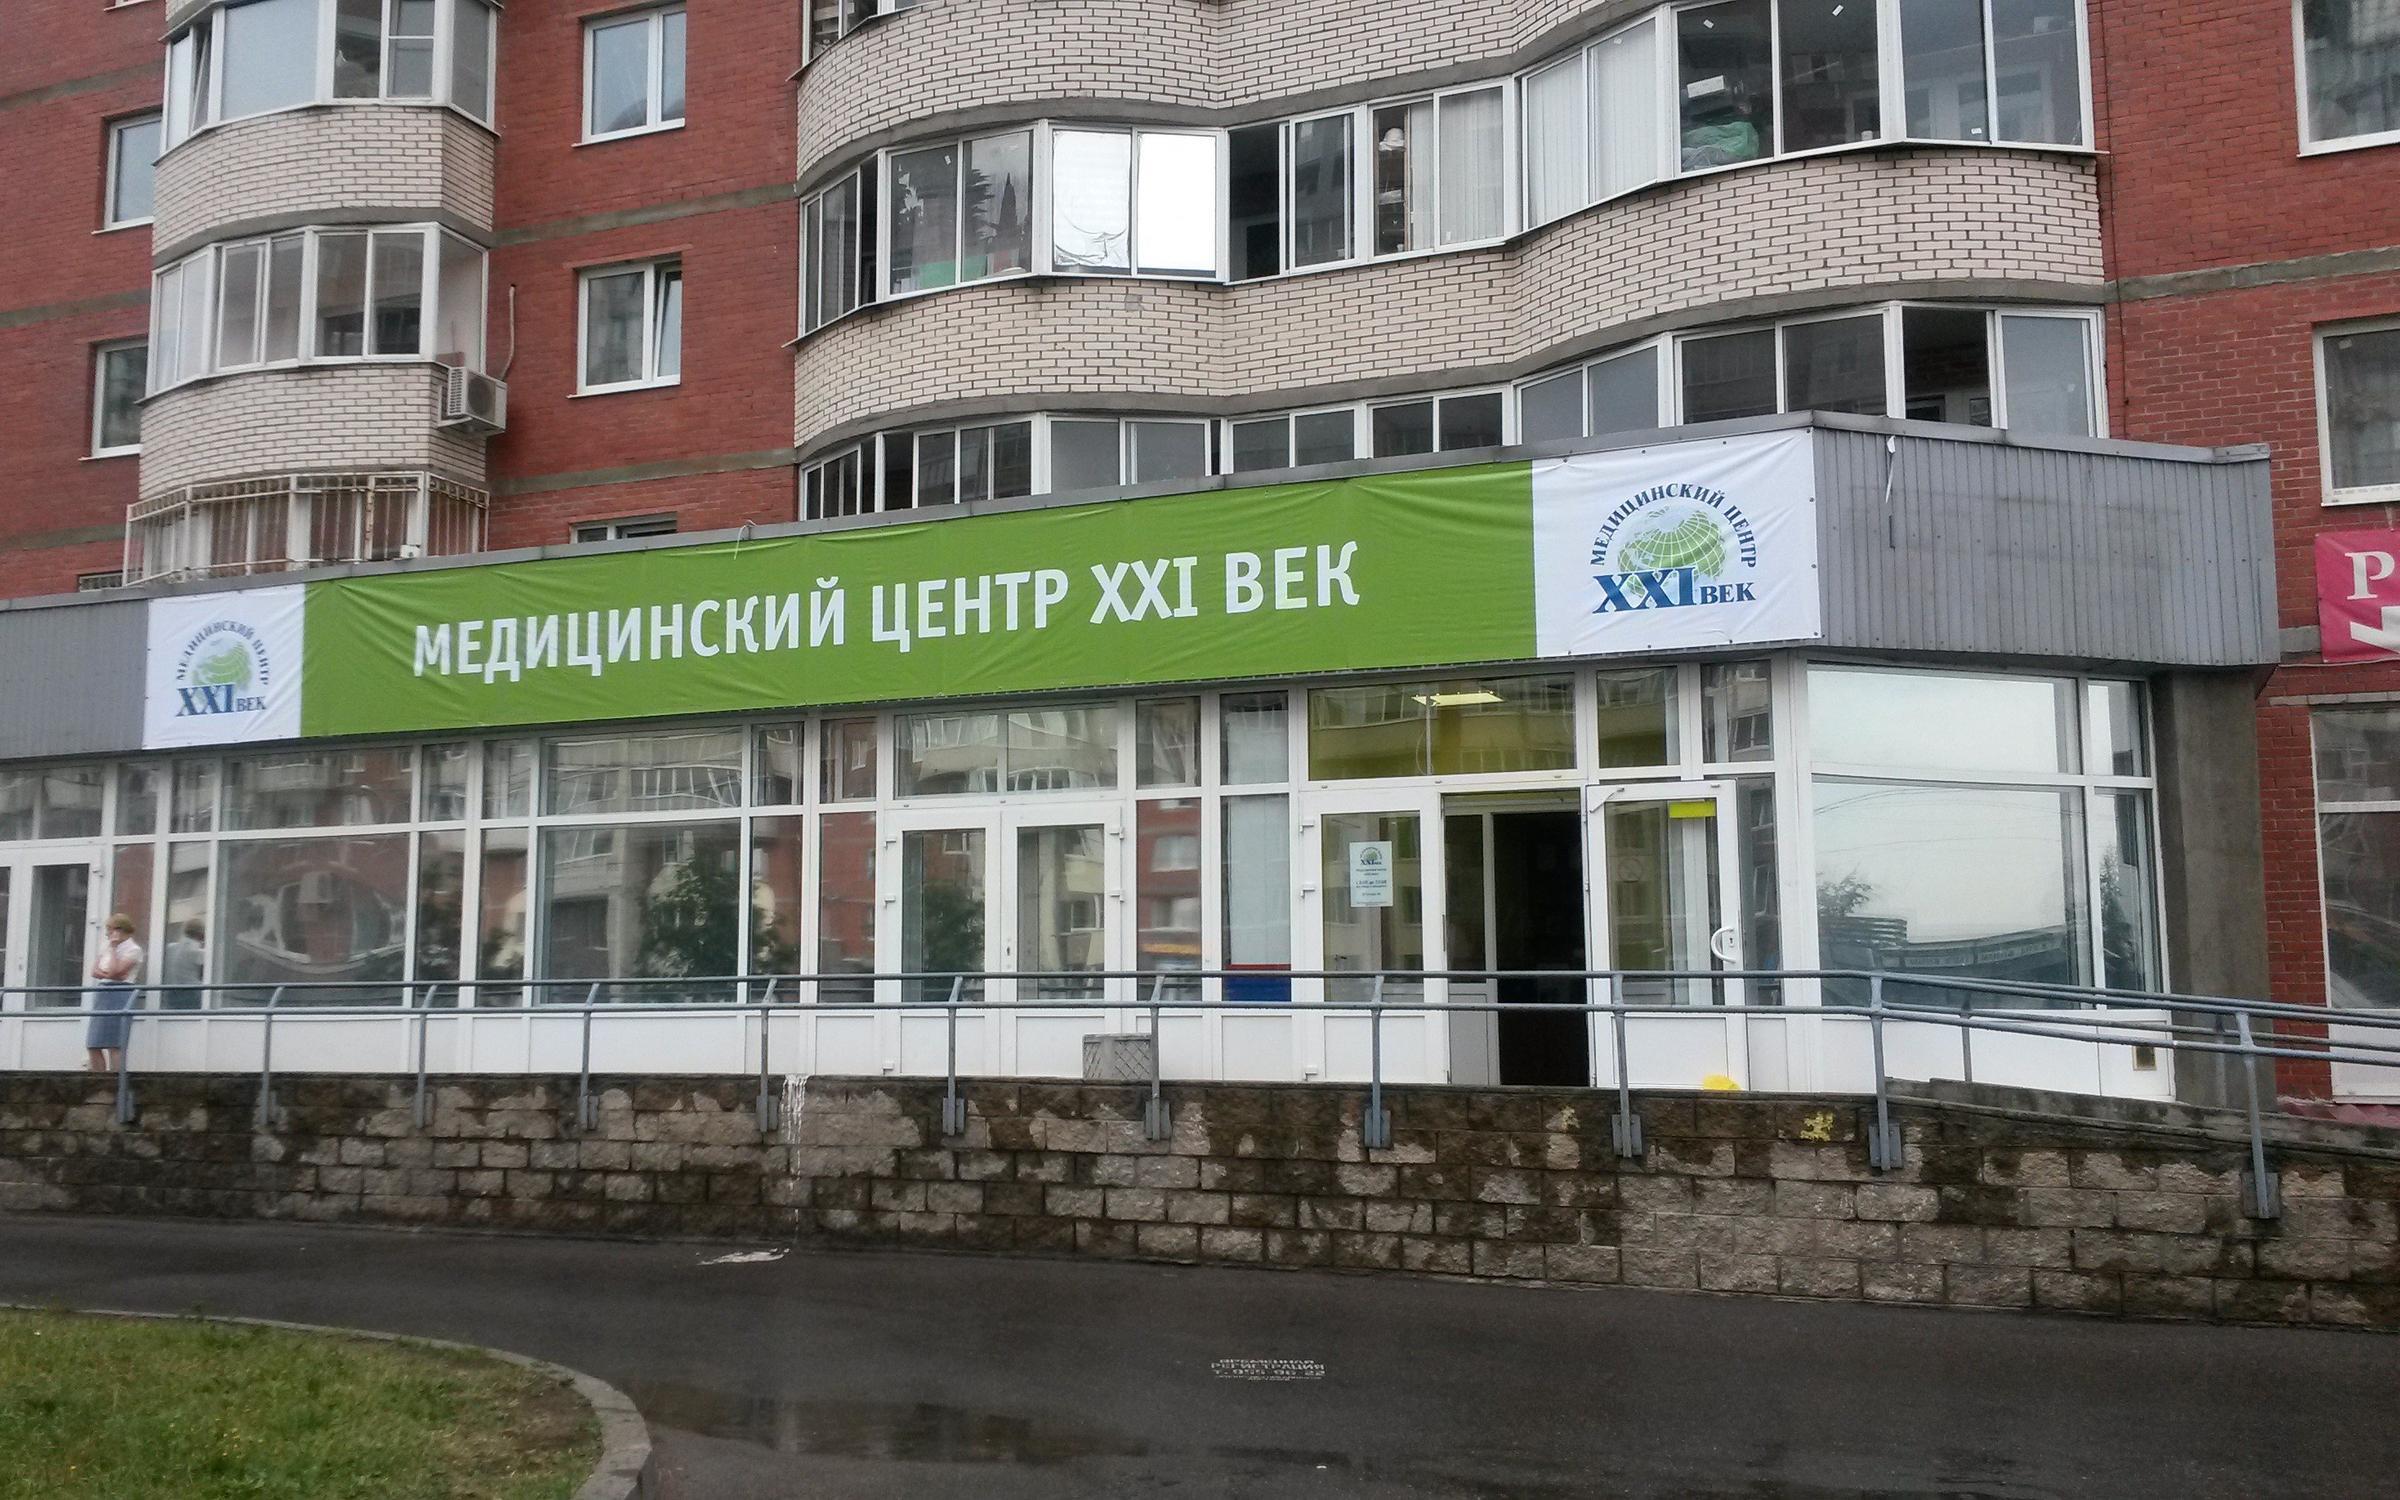 фотография Медицинского центра XXI век на улице Щербакова